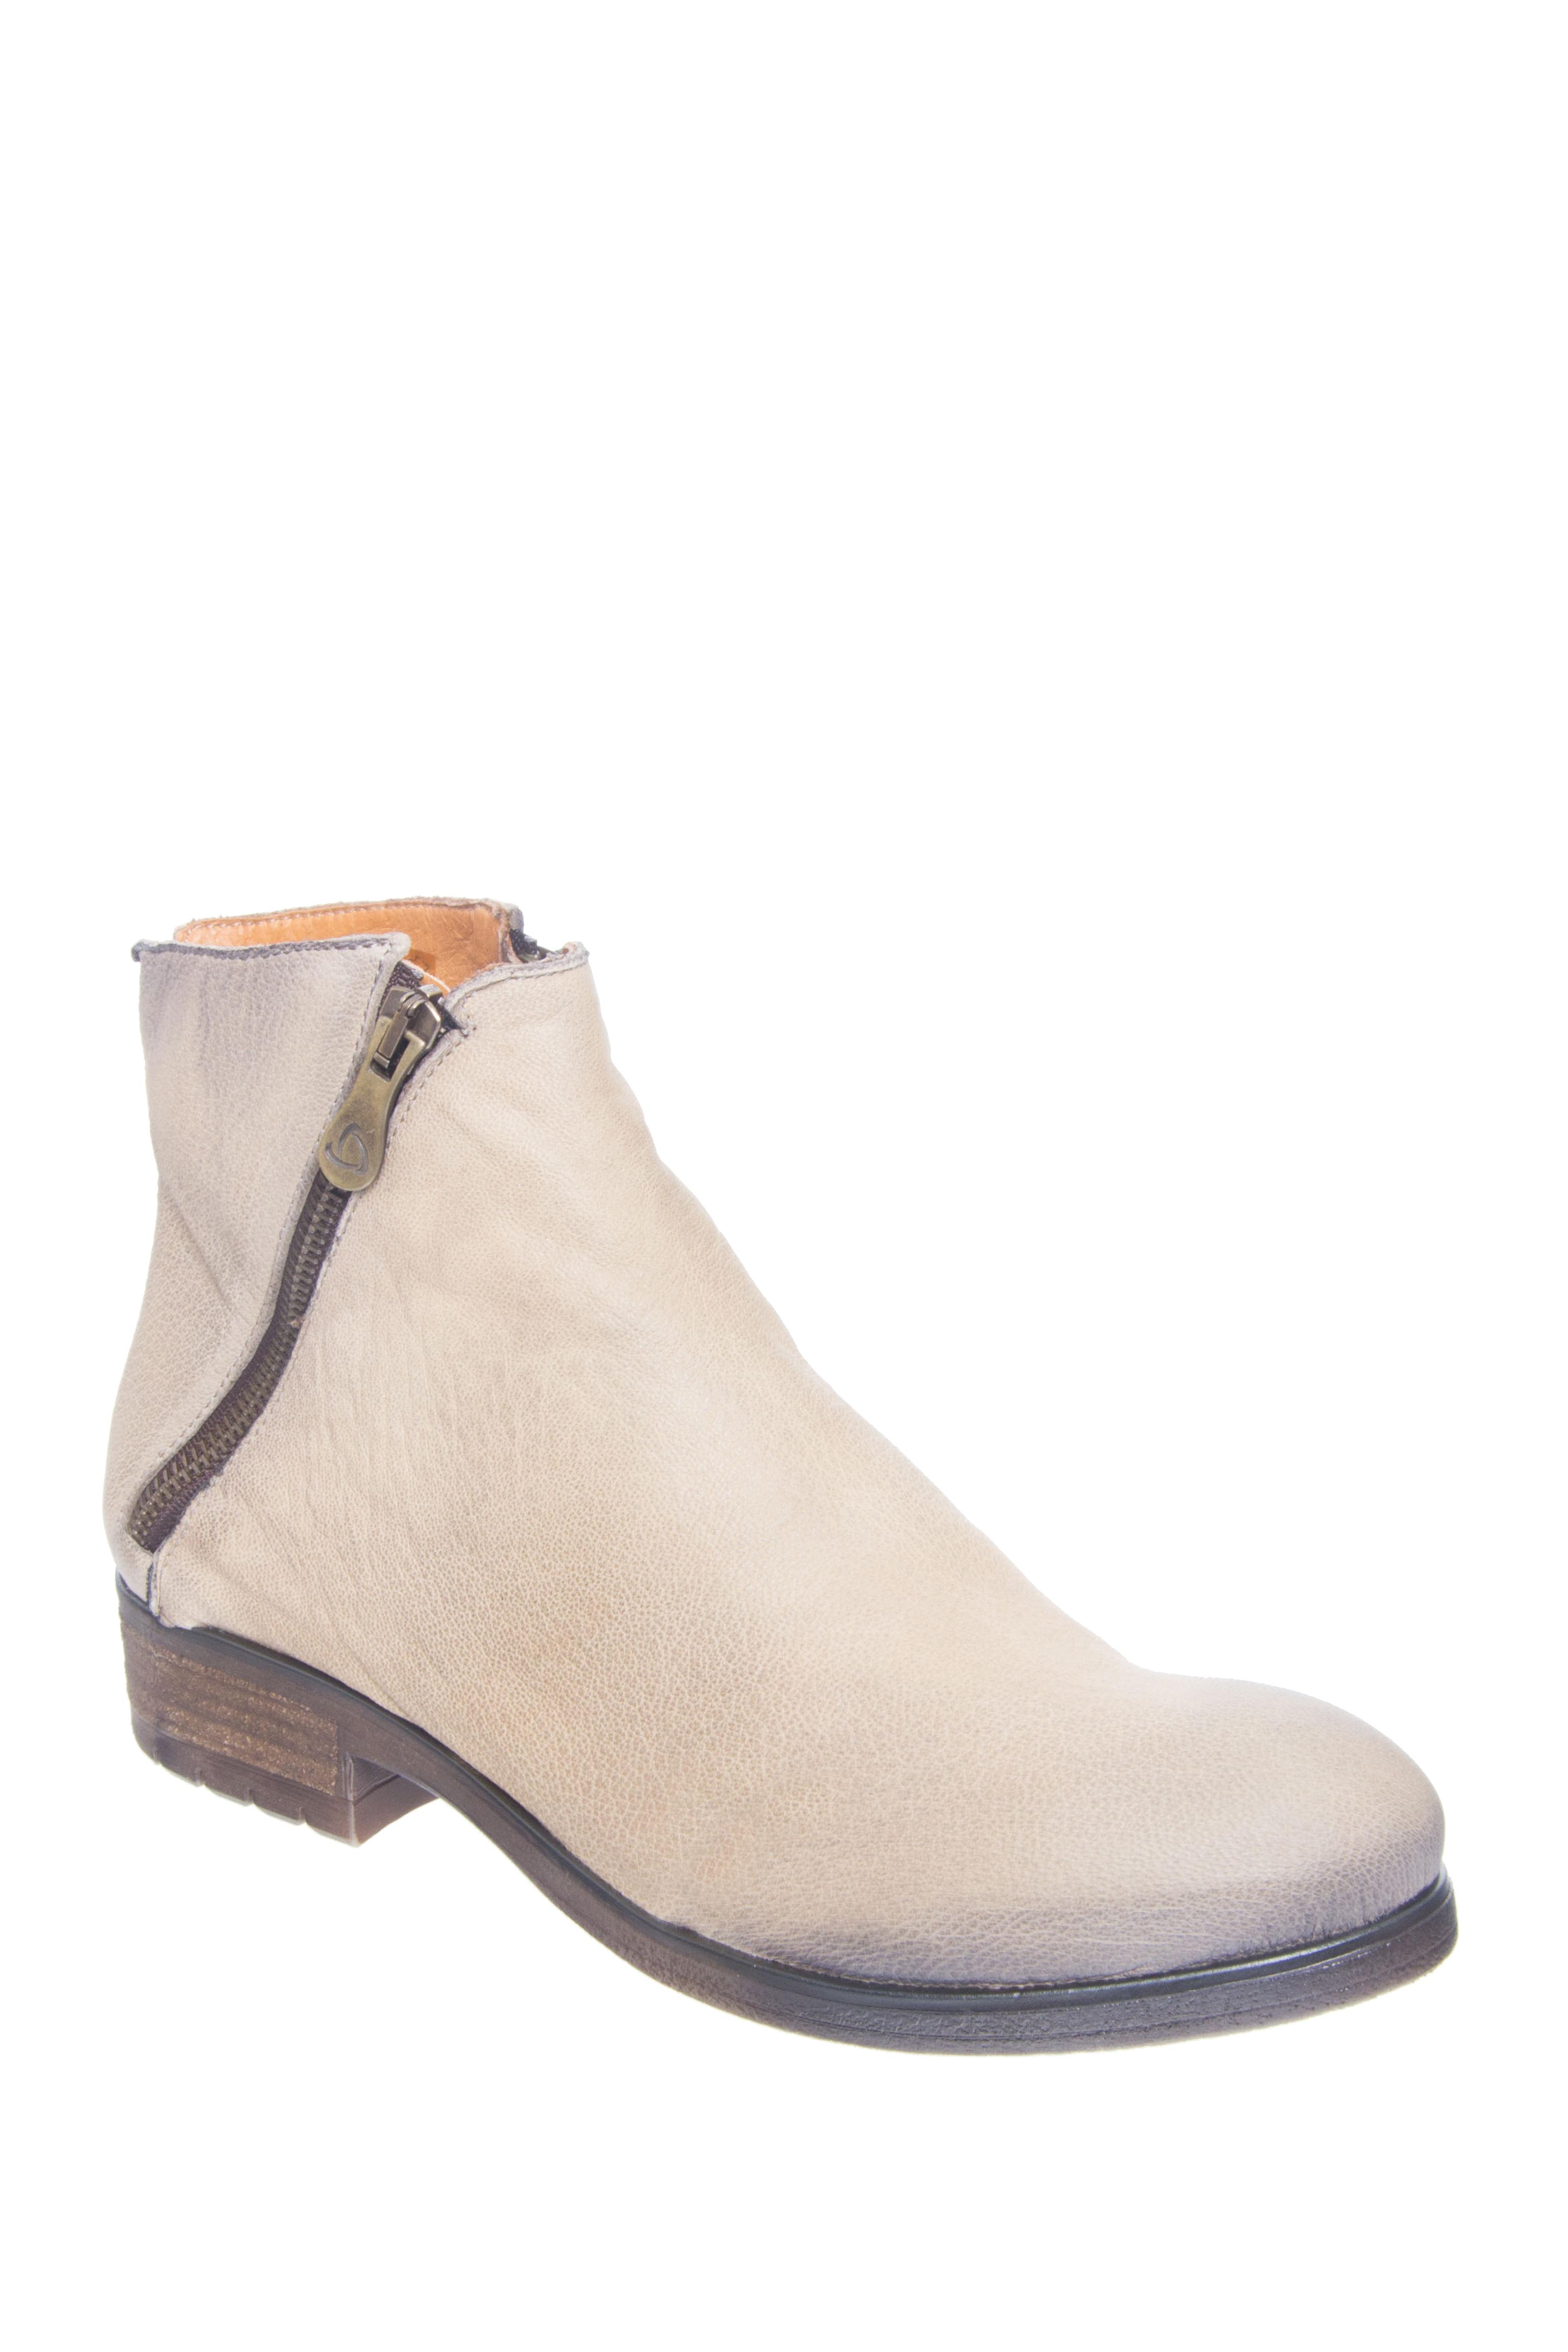 KANNA Oporto Low Heel Booties - Taupe